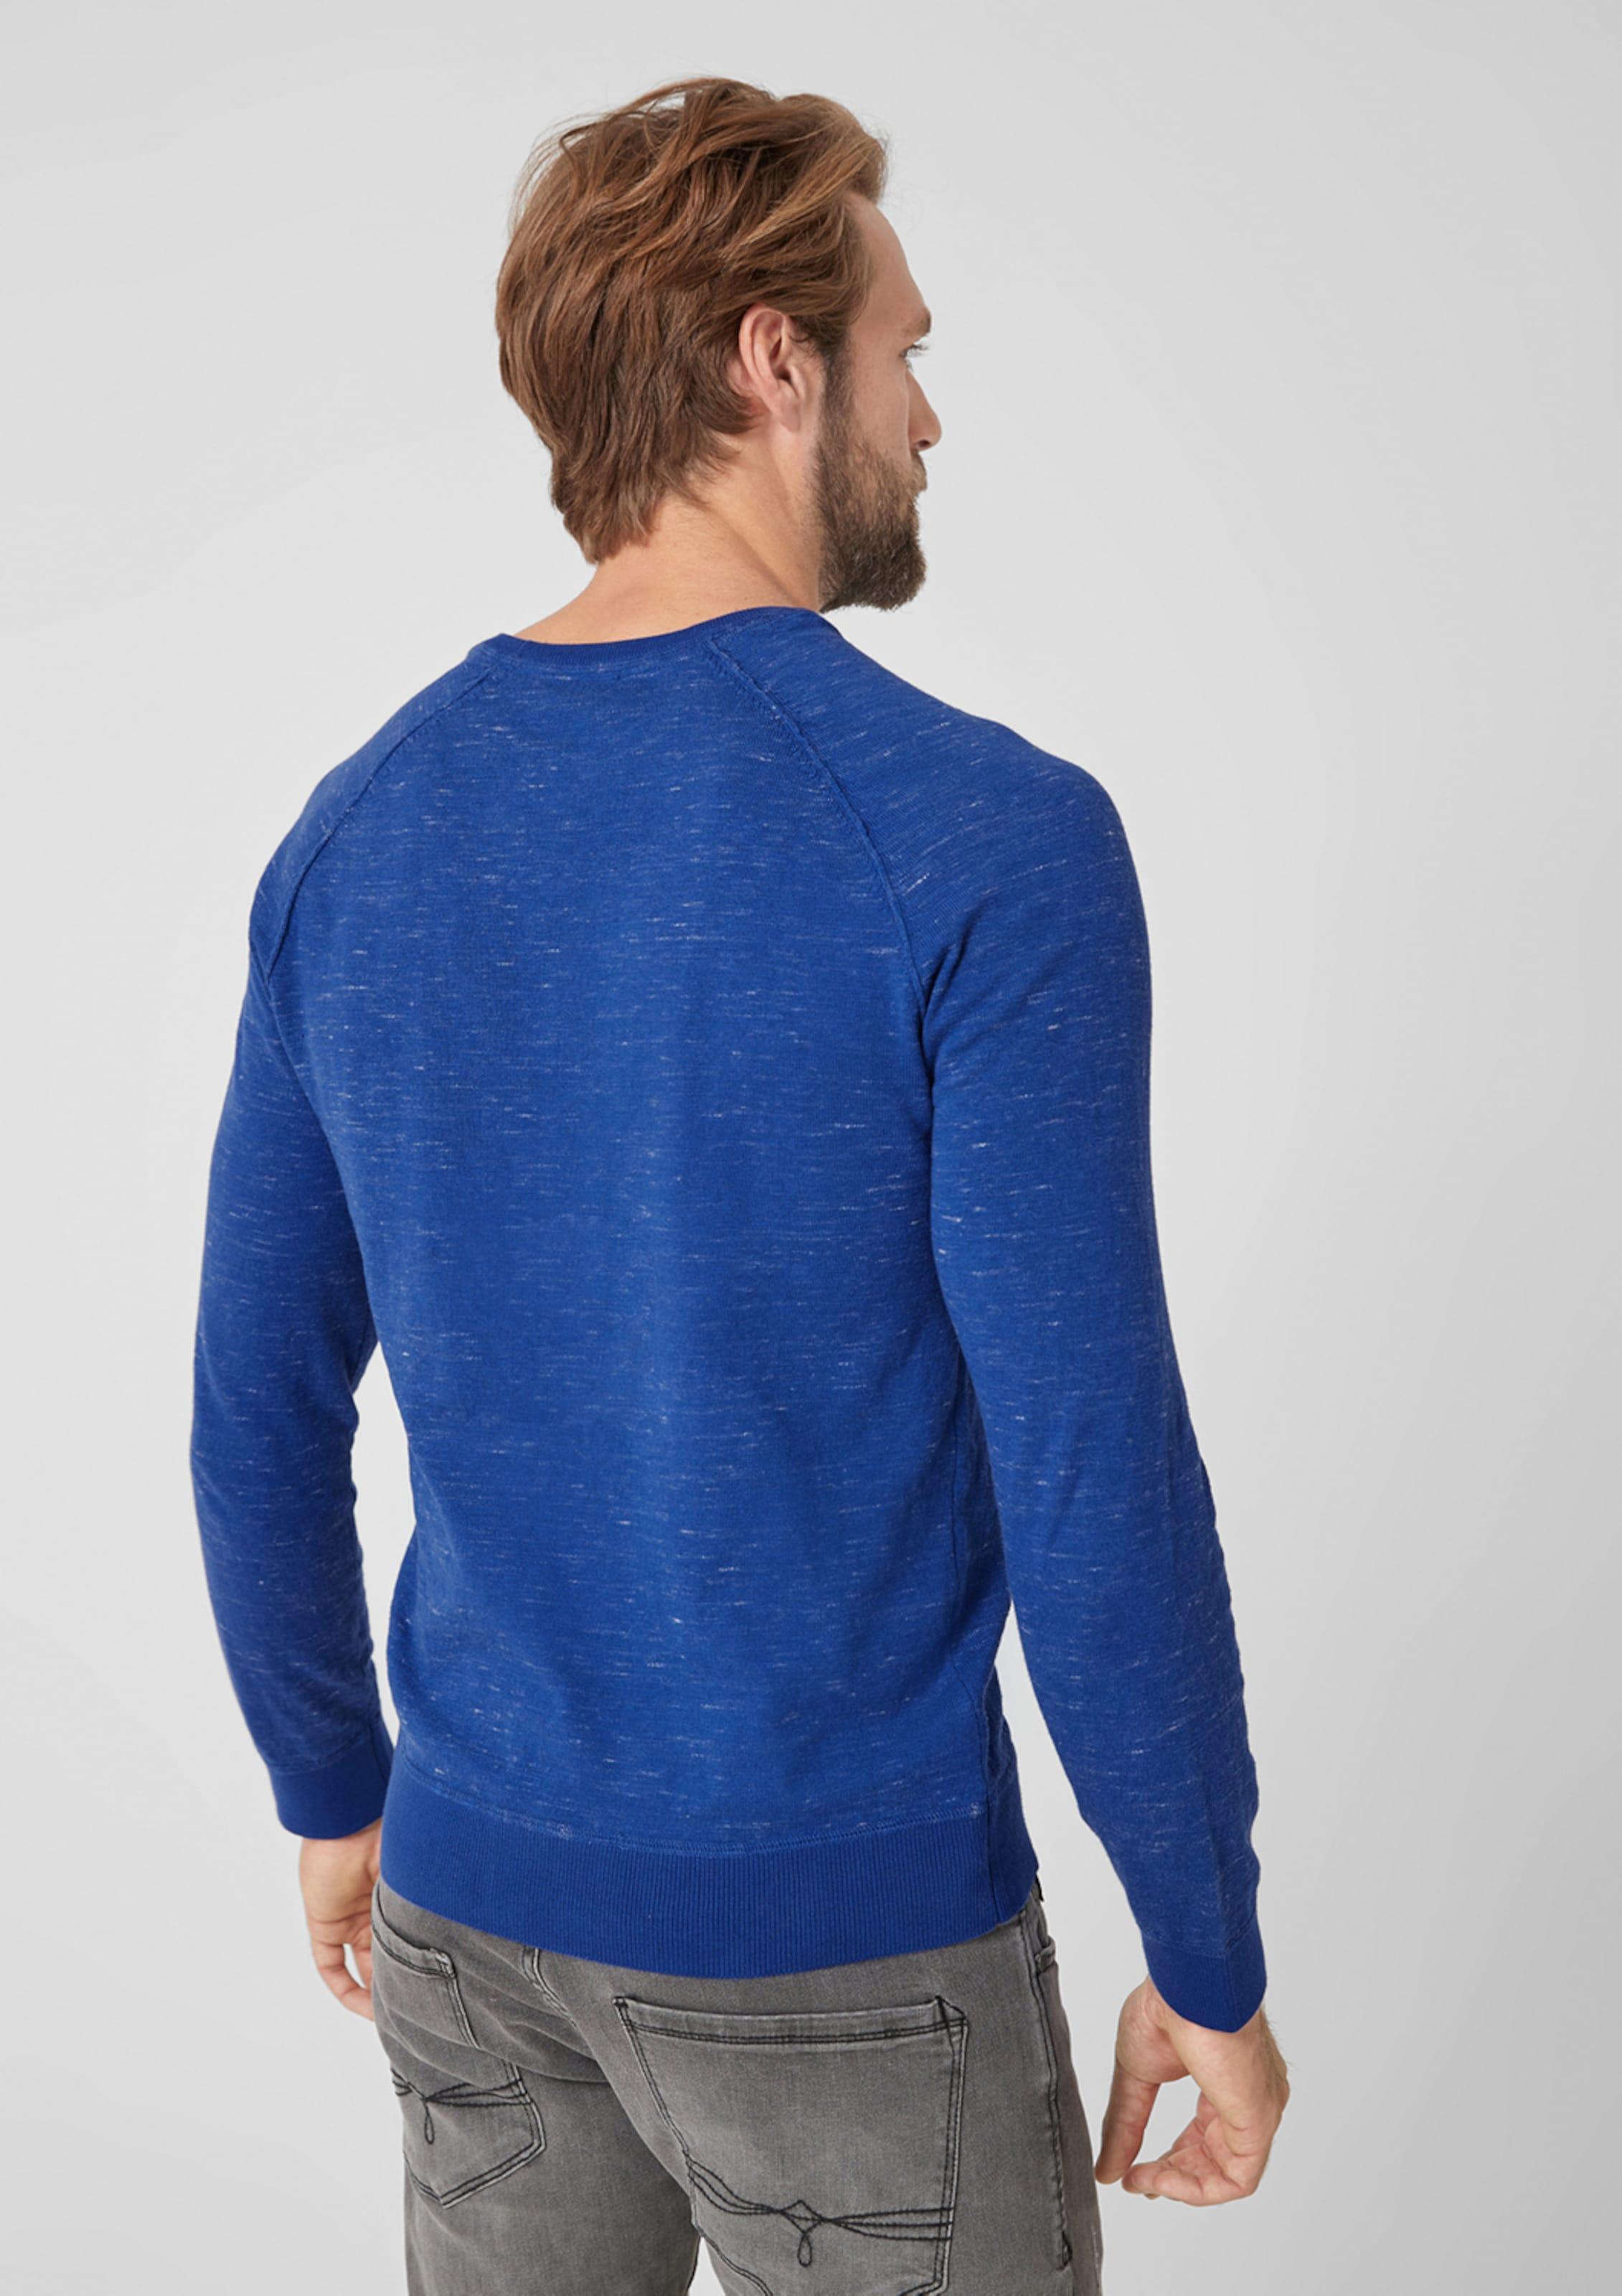 oliver Pullover Blau S In Label Red j4RLq3c5A